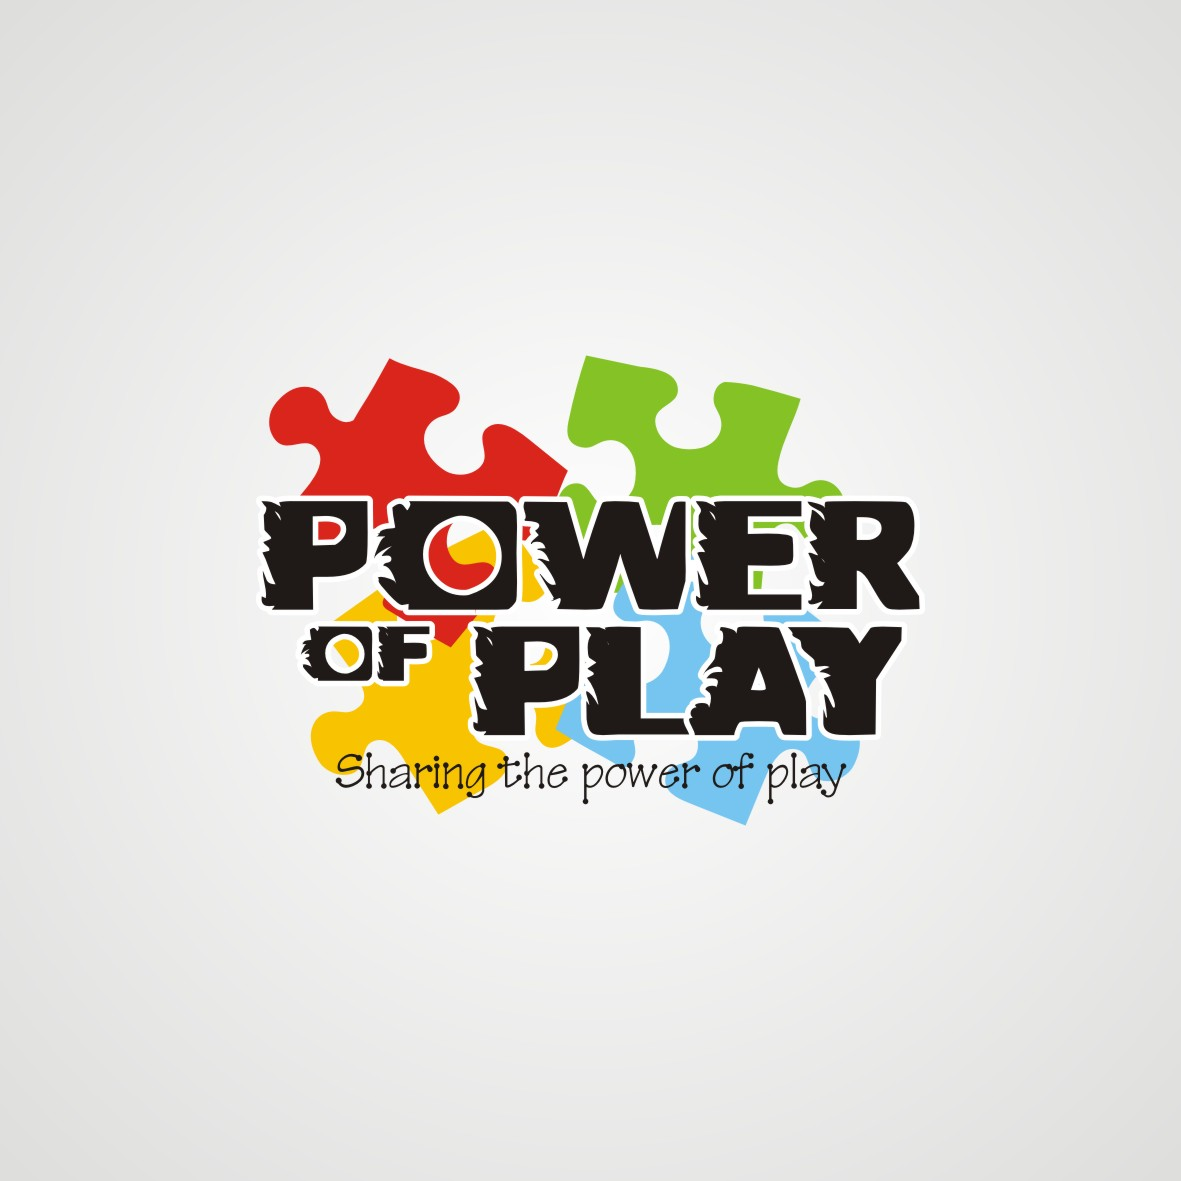 Logo Design by arteo_design - Entry No. 79 in the Logo Design Contest Power Of Play Logo Design.